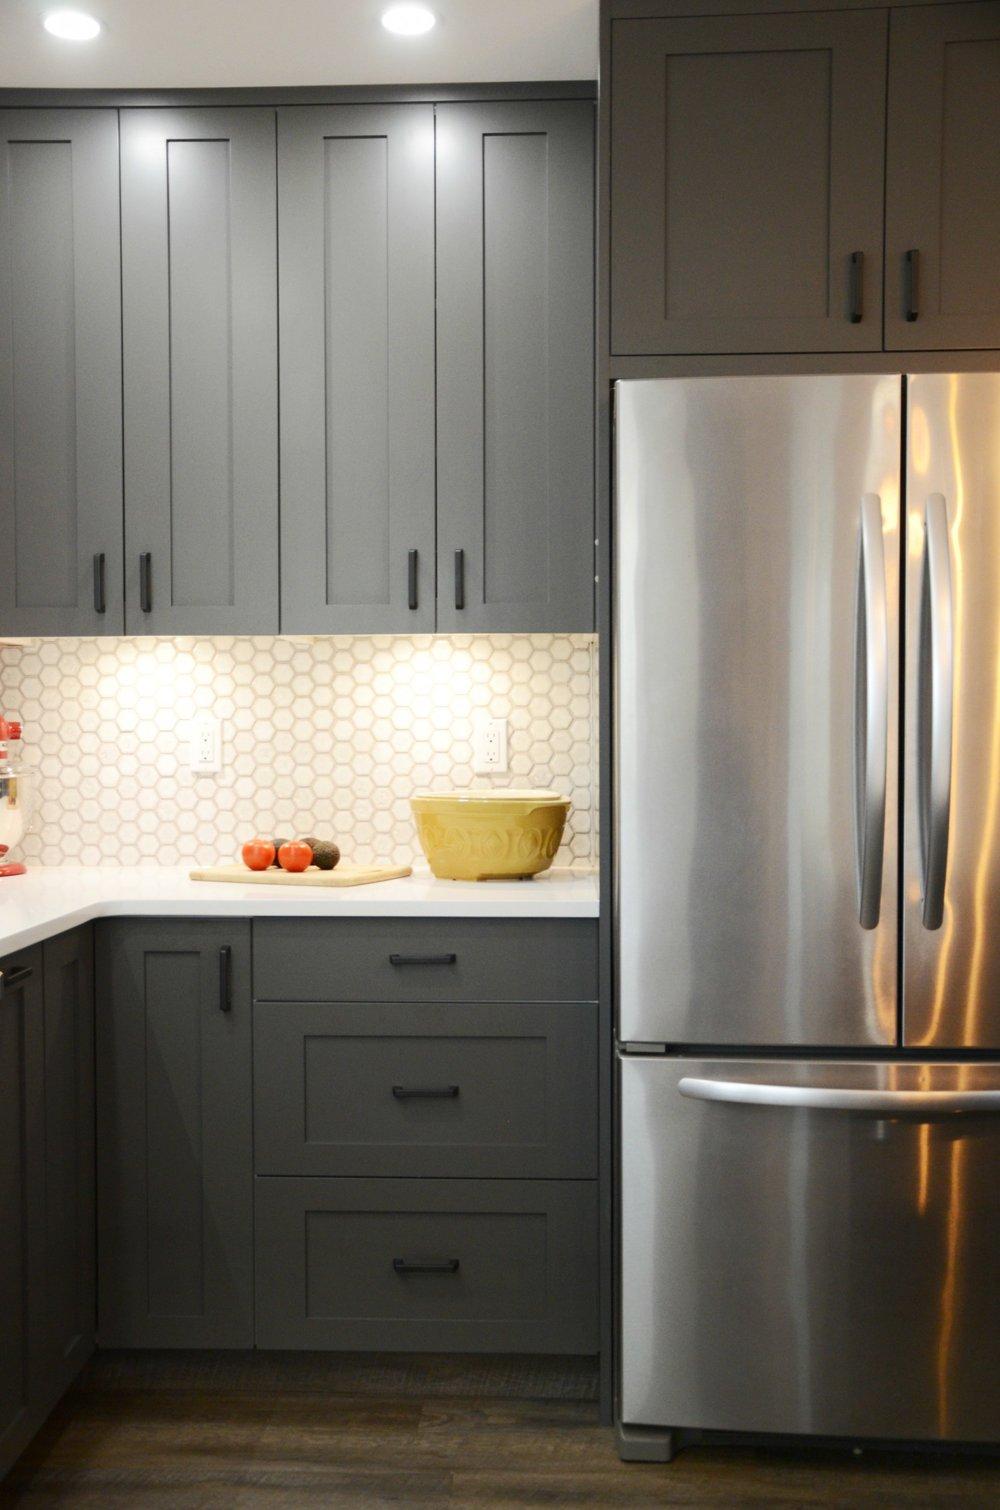 calgary-interior-design-kitchen-renovation-modern-farmhouse-45.jpg